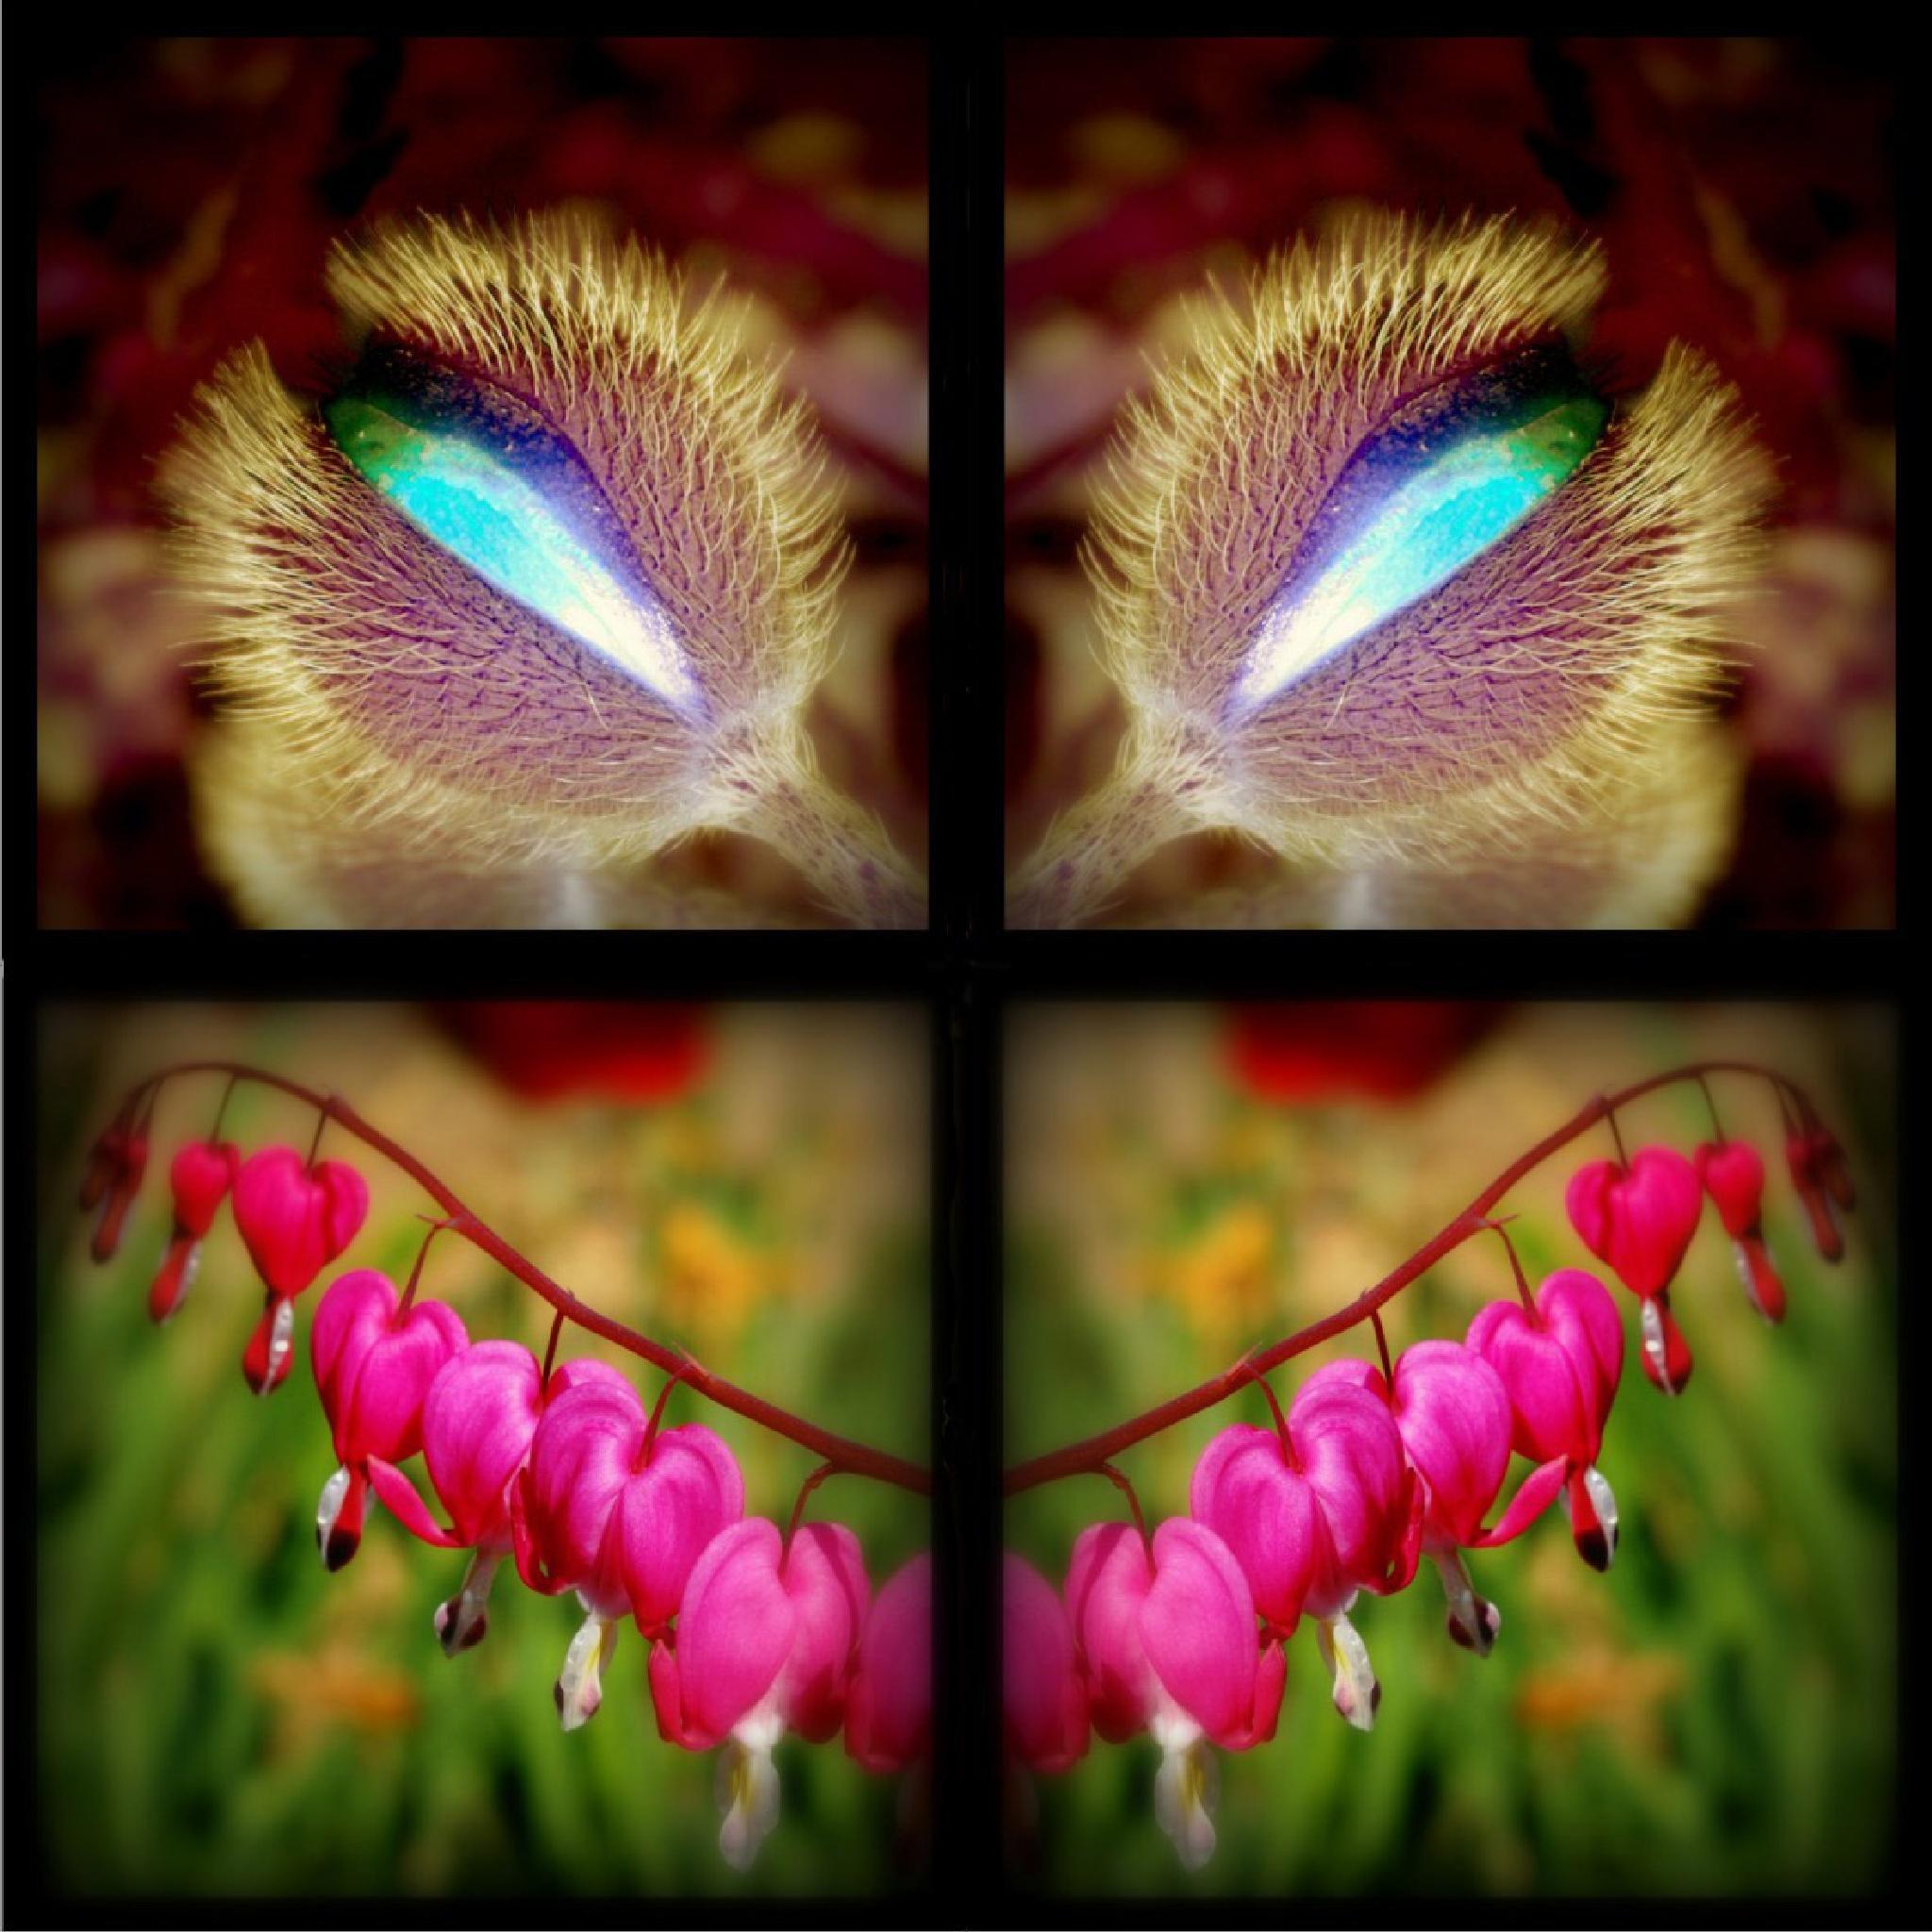 Mirrored - Hidden World #3 by Talosi Laszlo Photography